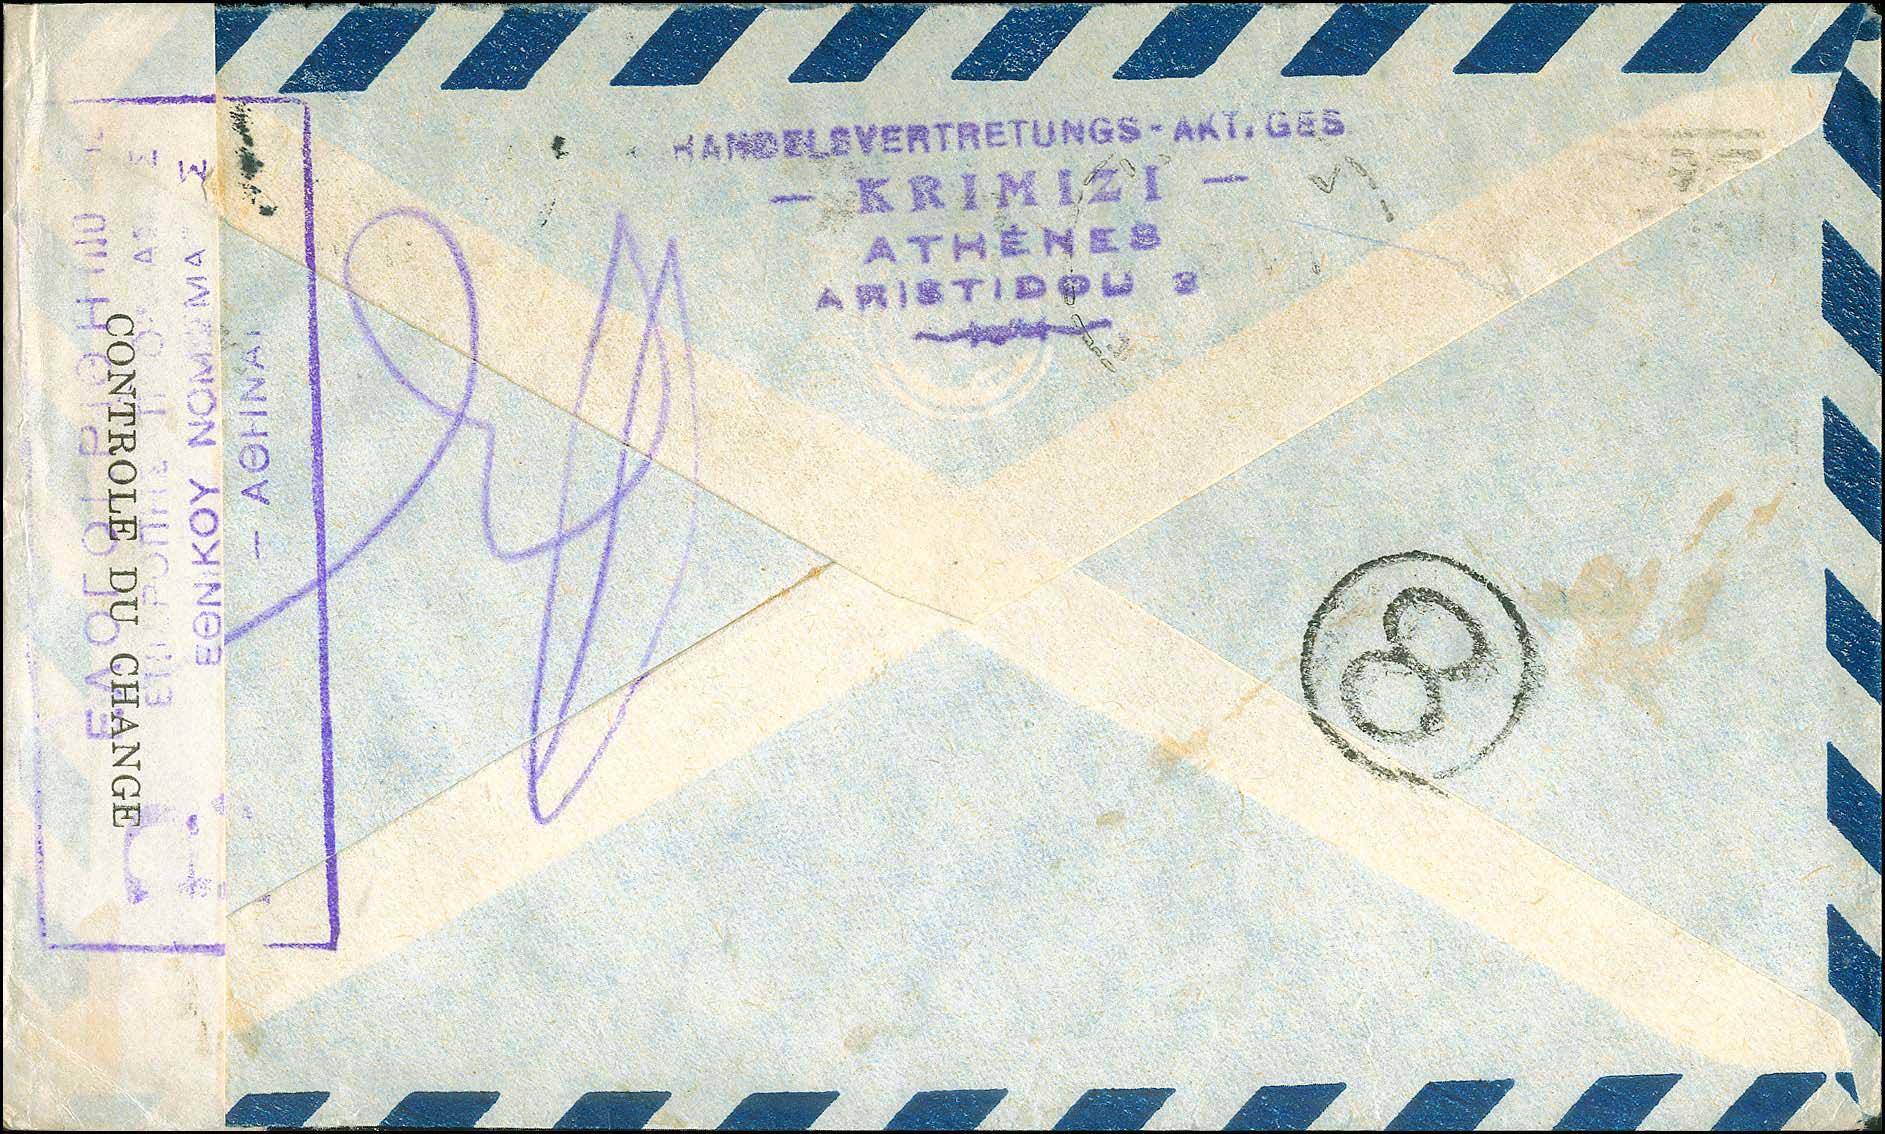 Lot 1151 - GREECE-  POSTMARKS & CANCELLATIONS exchange control cachets -  A. Karamitsos